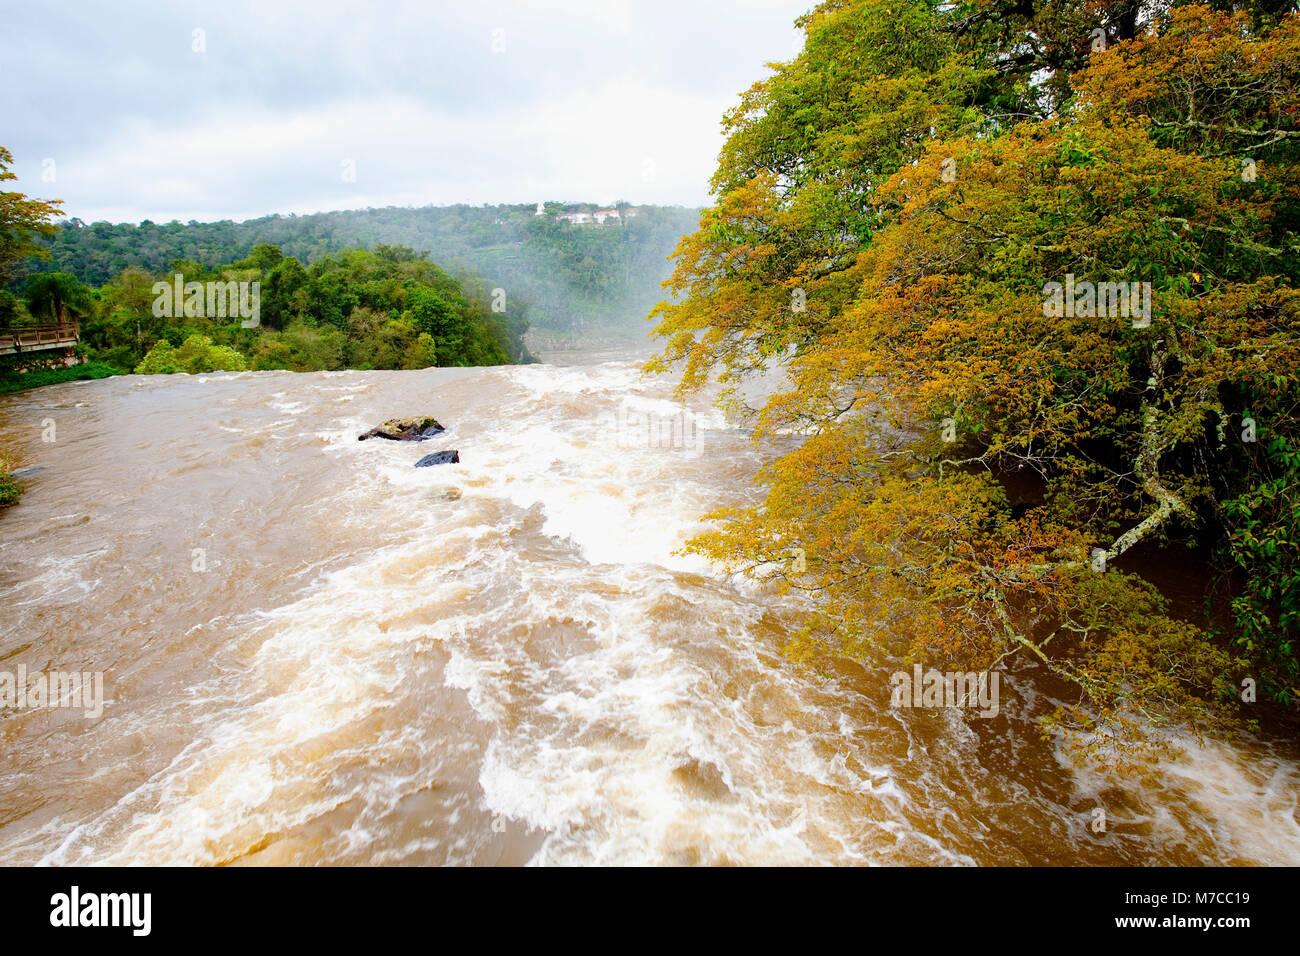 River flowing through a forest, Iguacu River, Puerto Iguazu, Misiones Province, Argentina - Stock Image